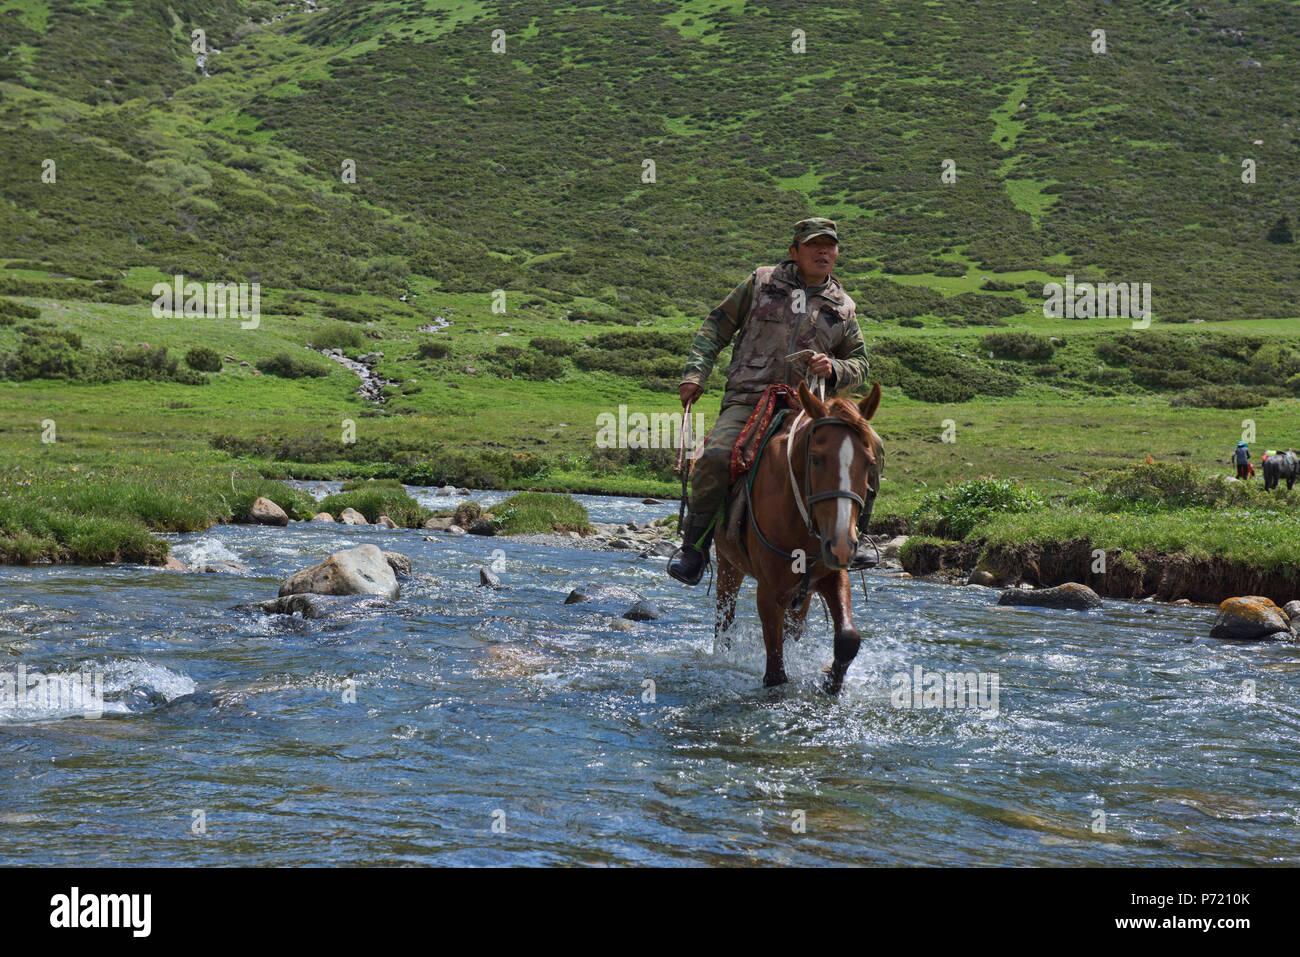 Kyrgyz horserider crossing the Tup River, Jyrgalan Valley, Kyrgyzstan Stock Photo